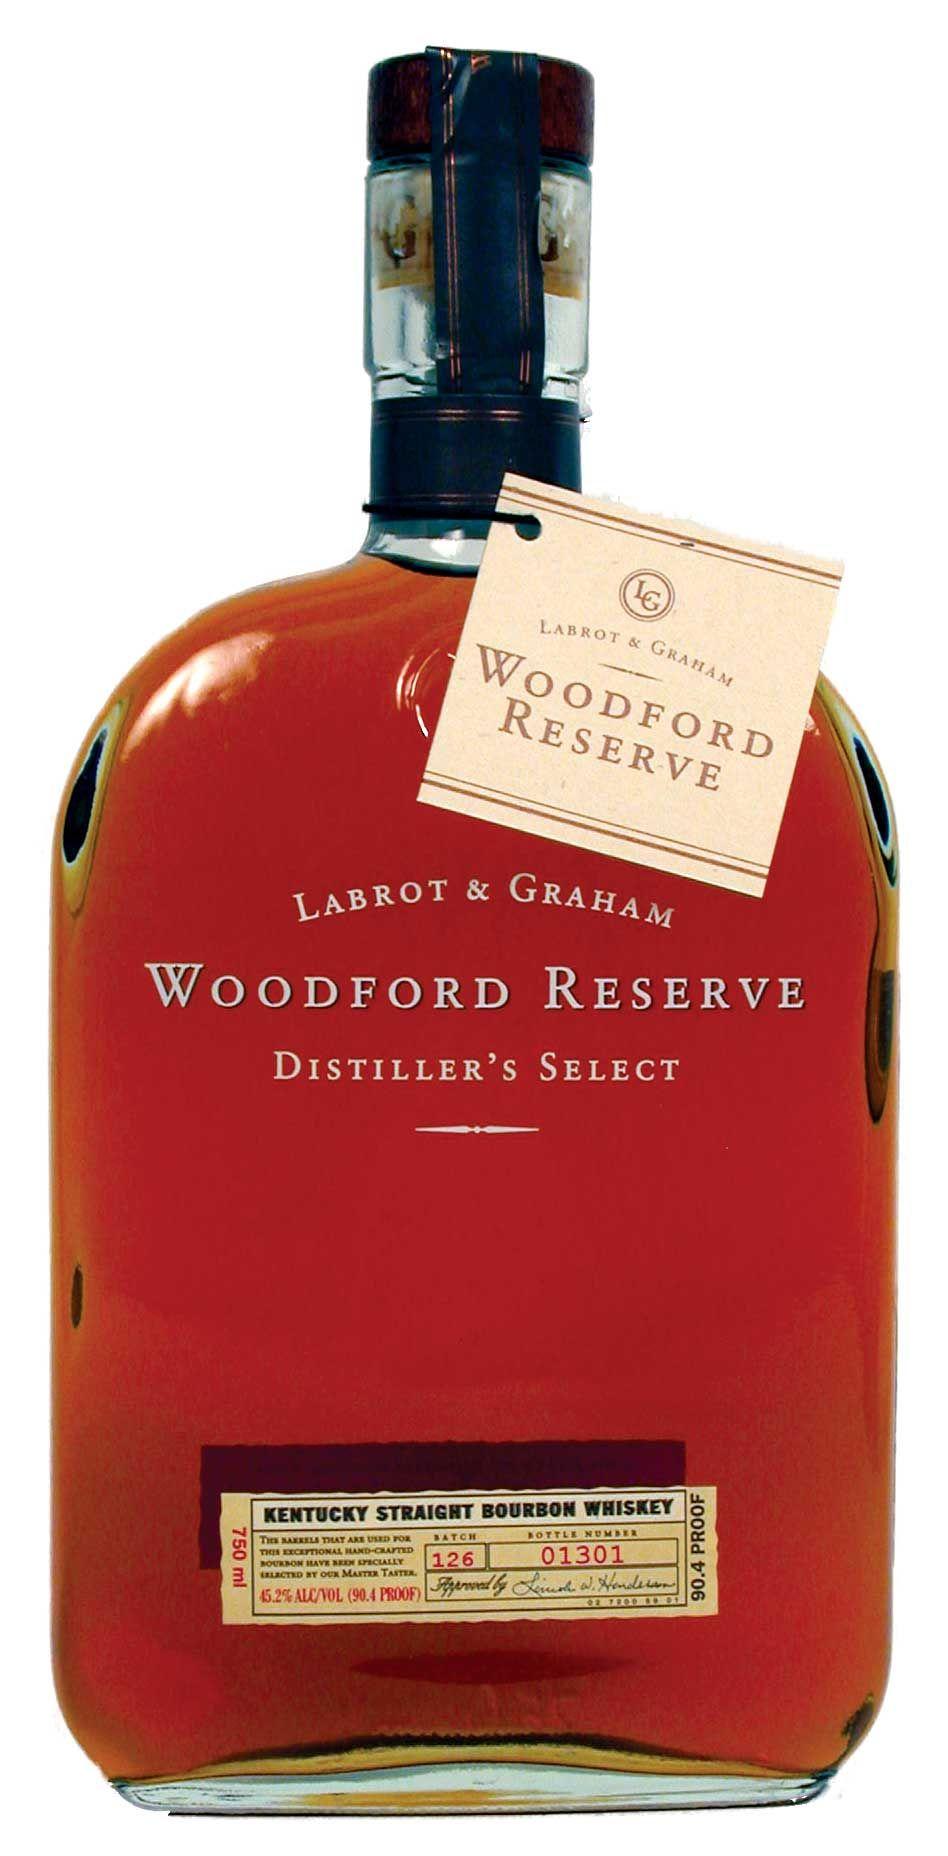 Woodford Reserve Bourbon Woodford Reserve Bourbon Bourbon Whiskey Whiskey